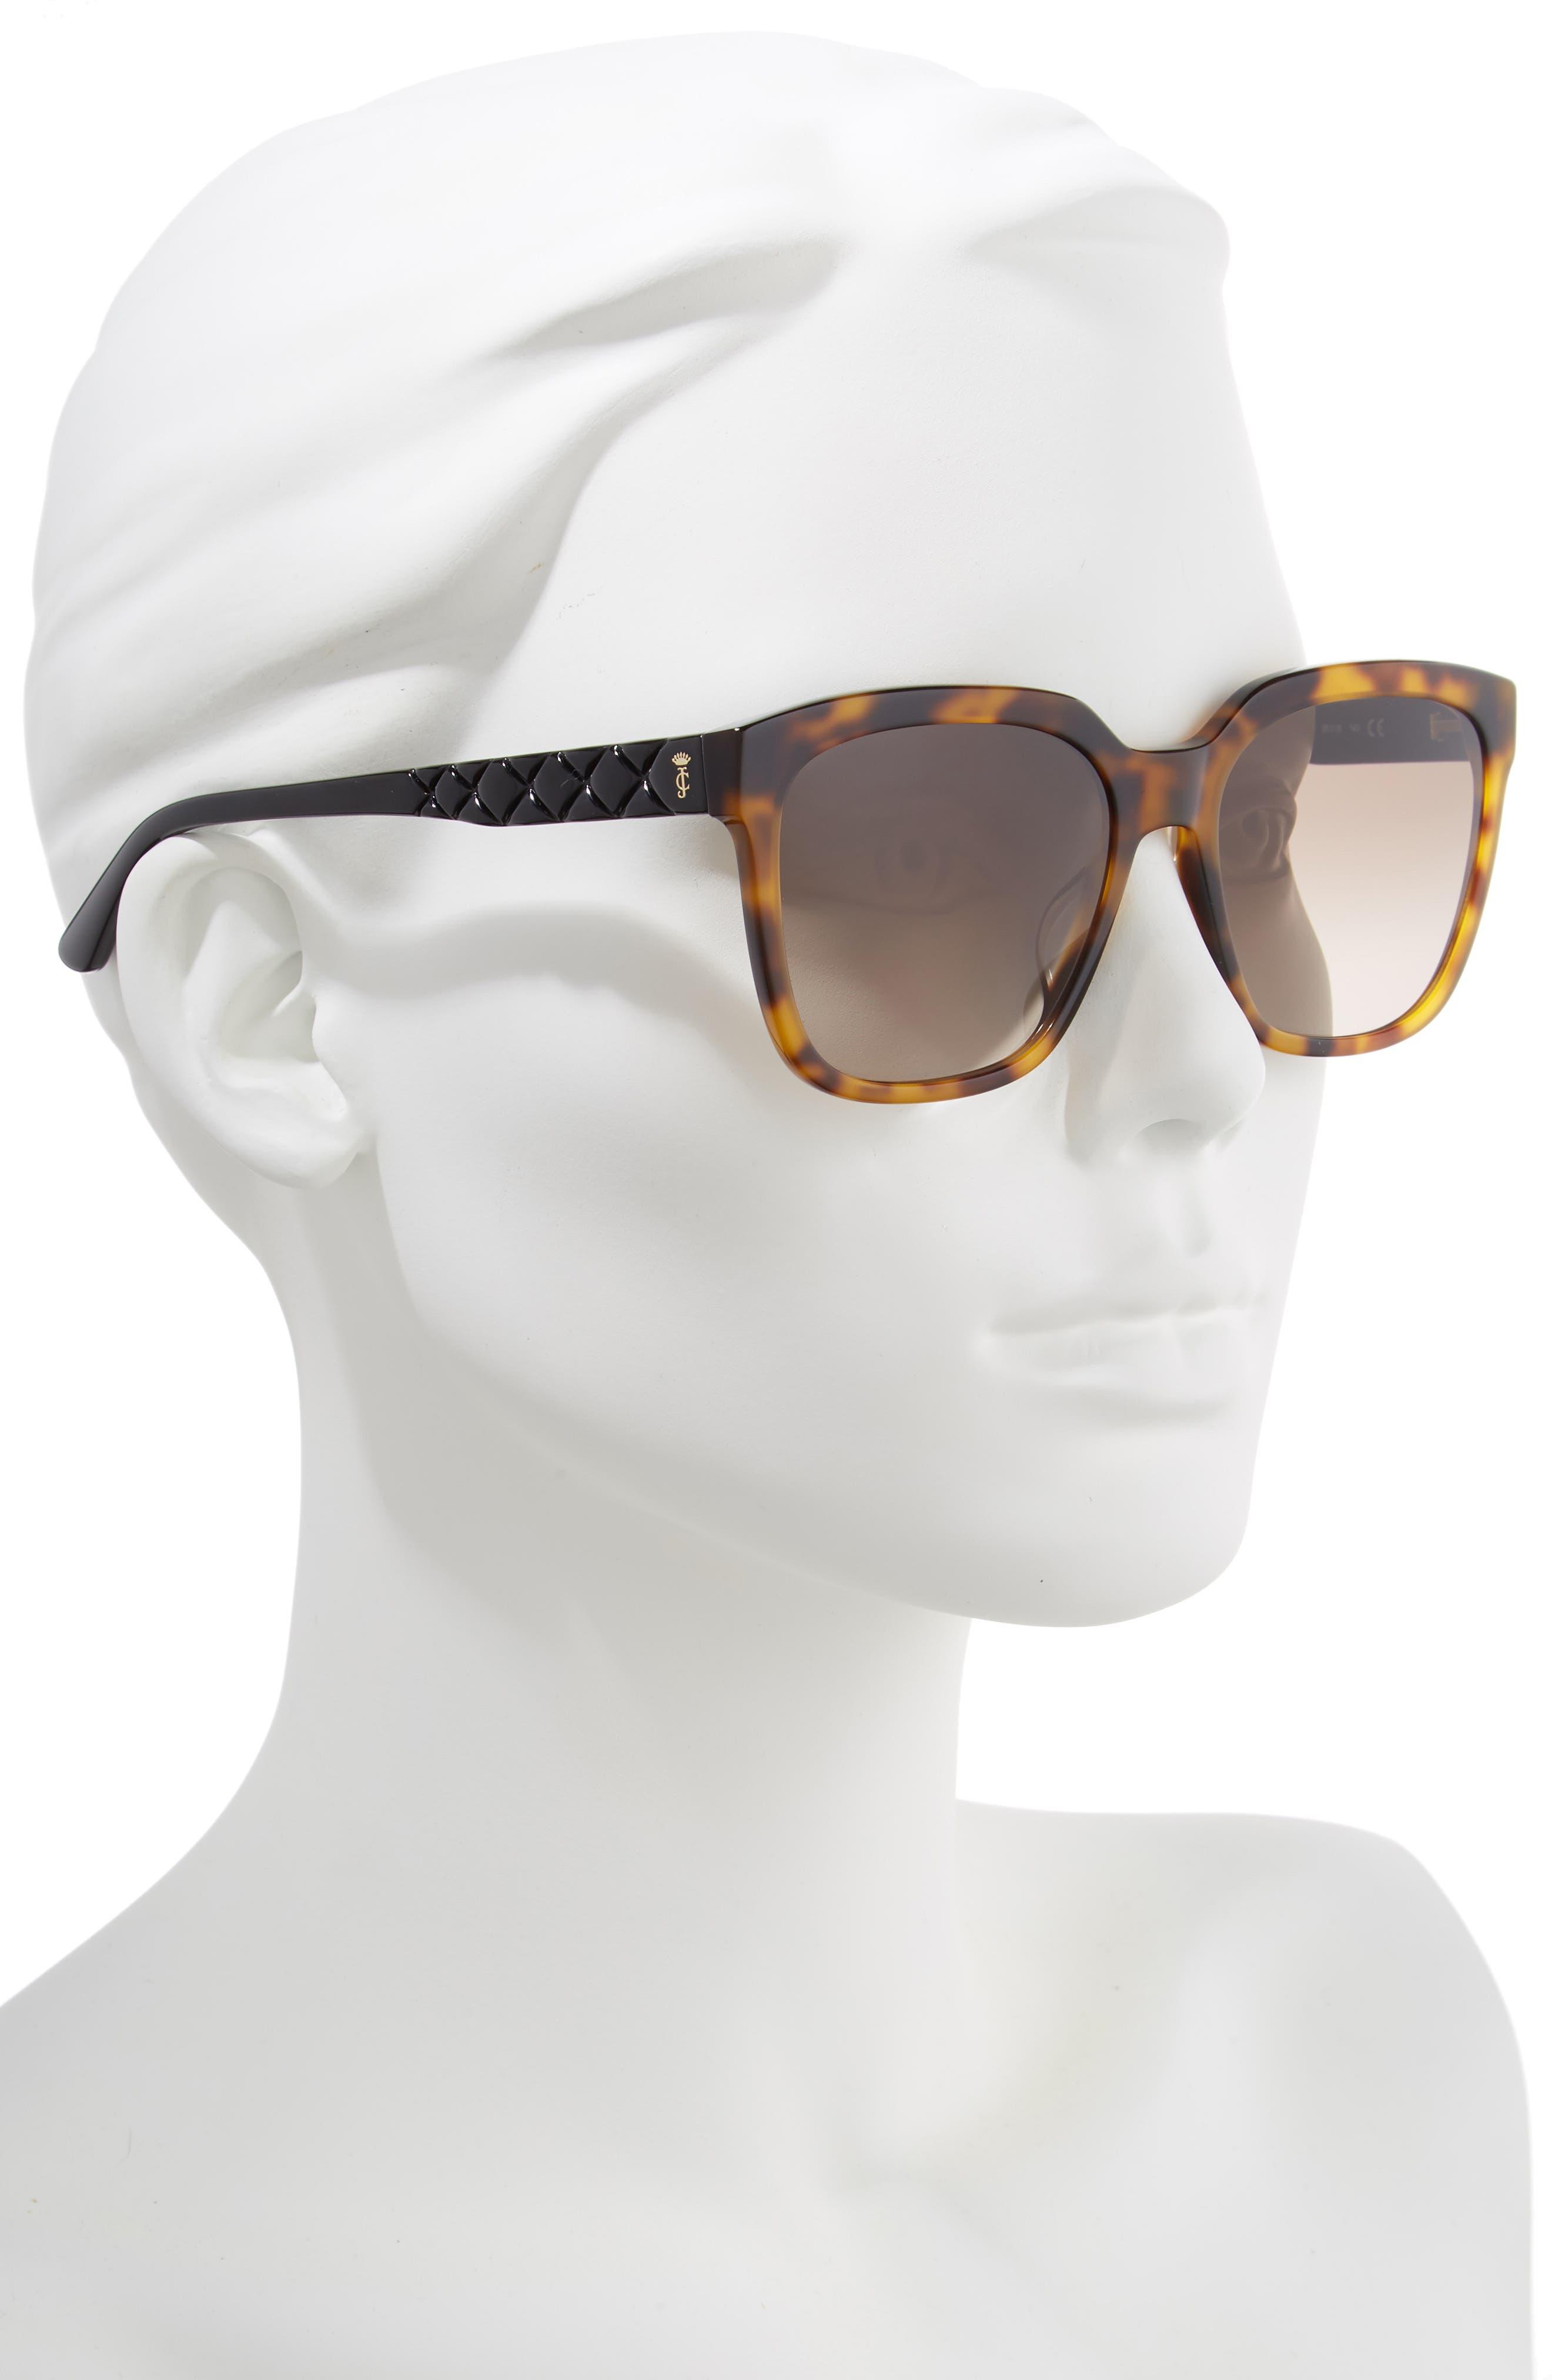 JUICY COUTURE, Core 55mm Square Sunglasses, Alternate thumbnail 2, color, BLACK